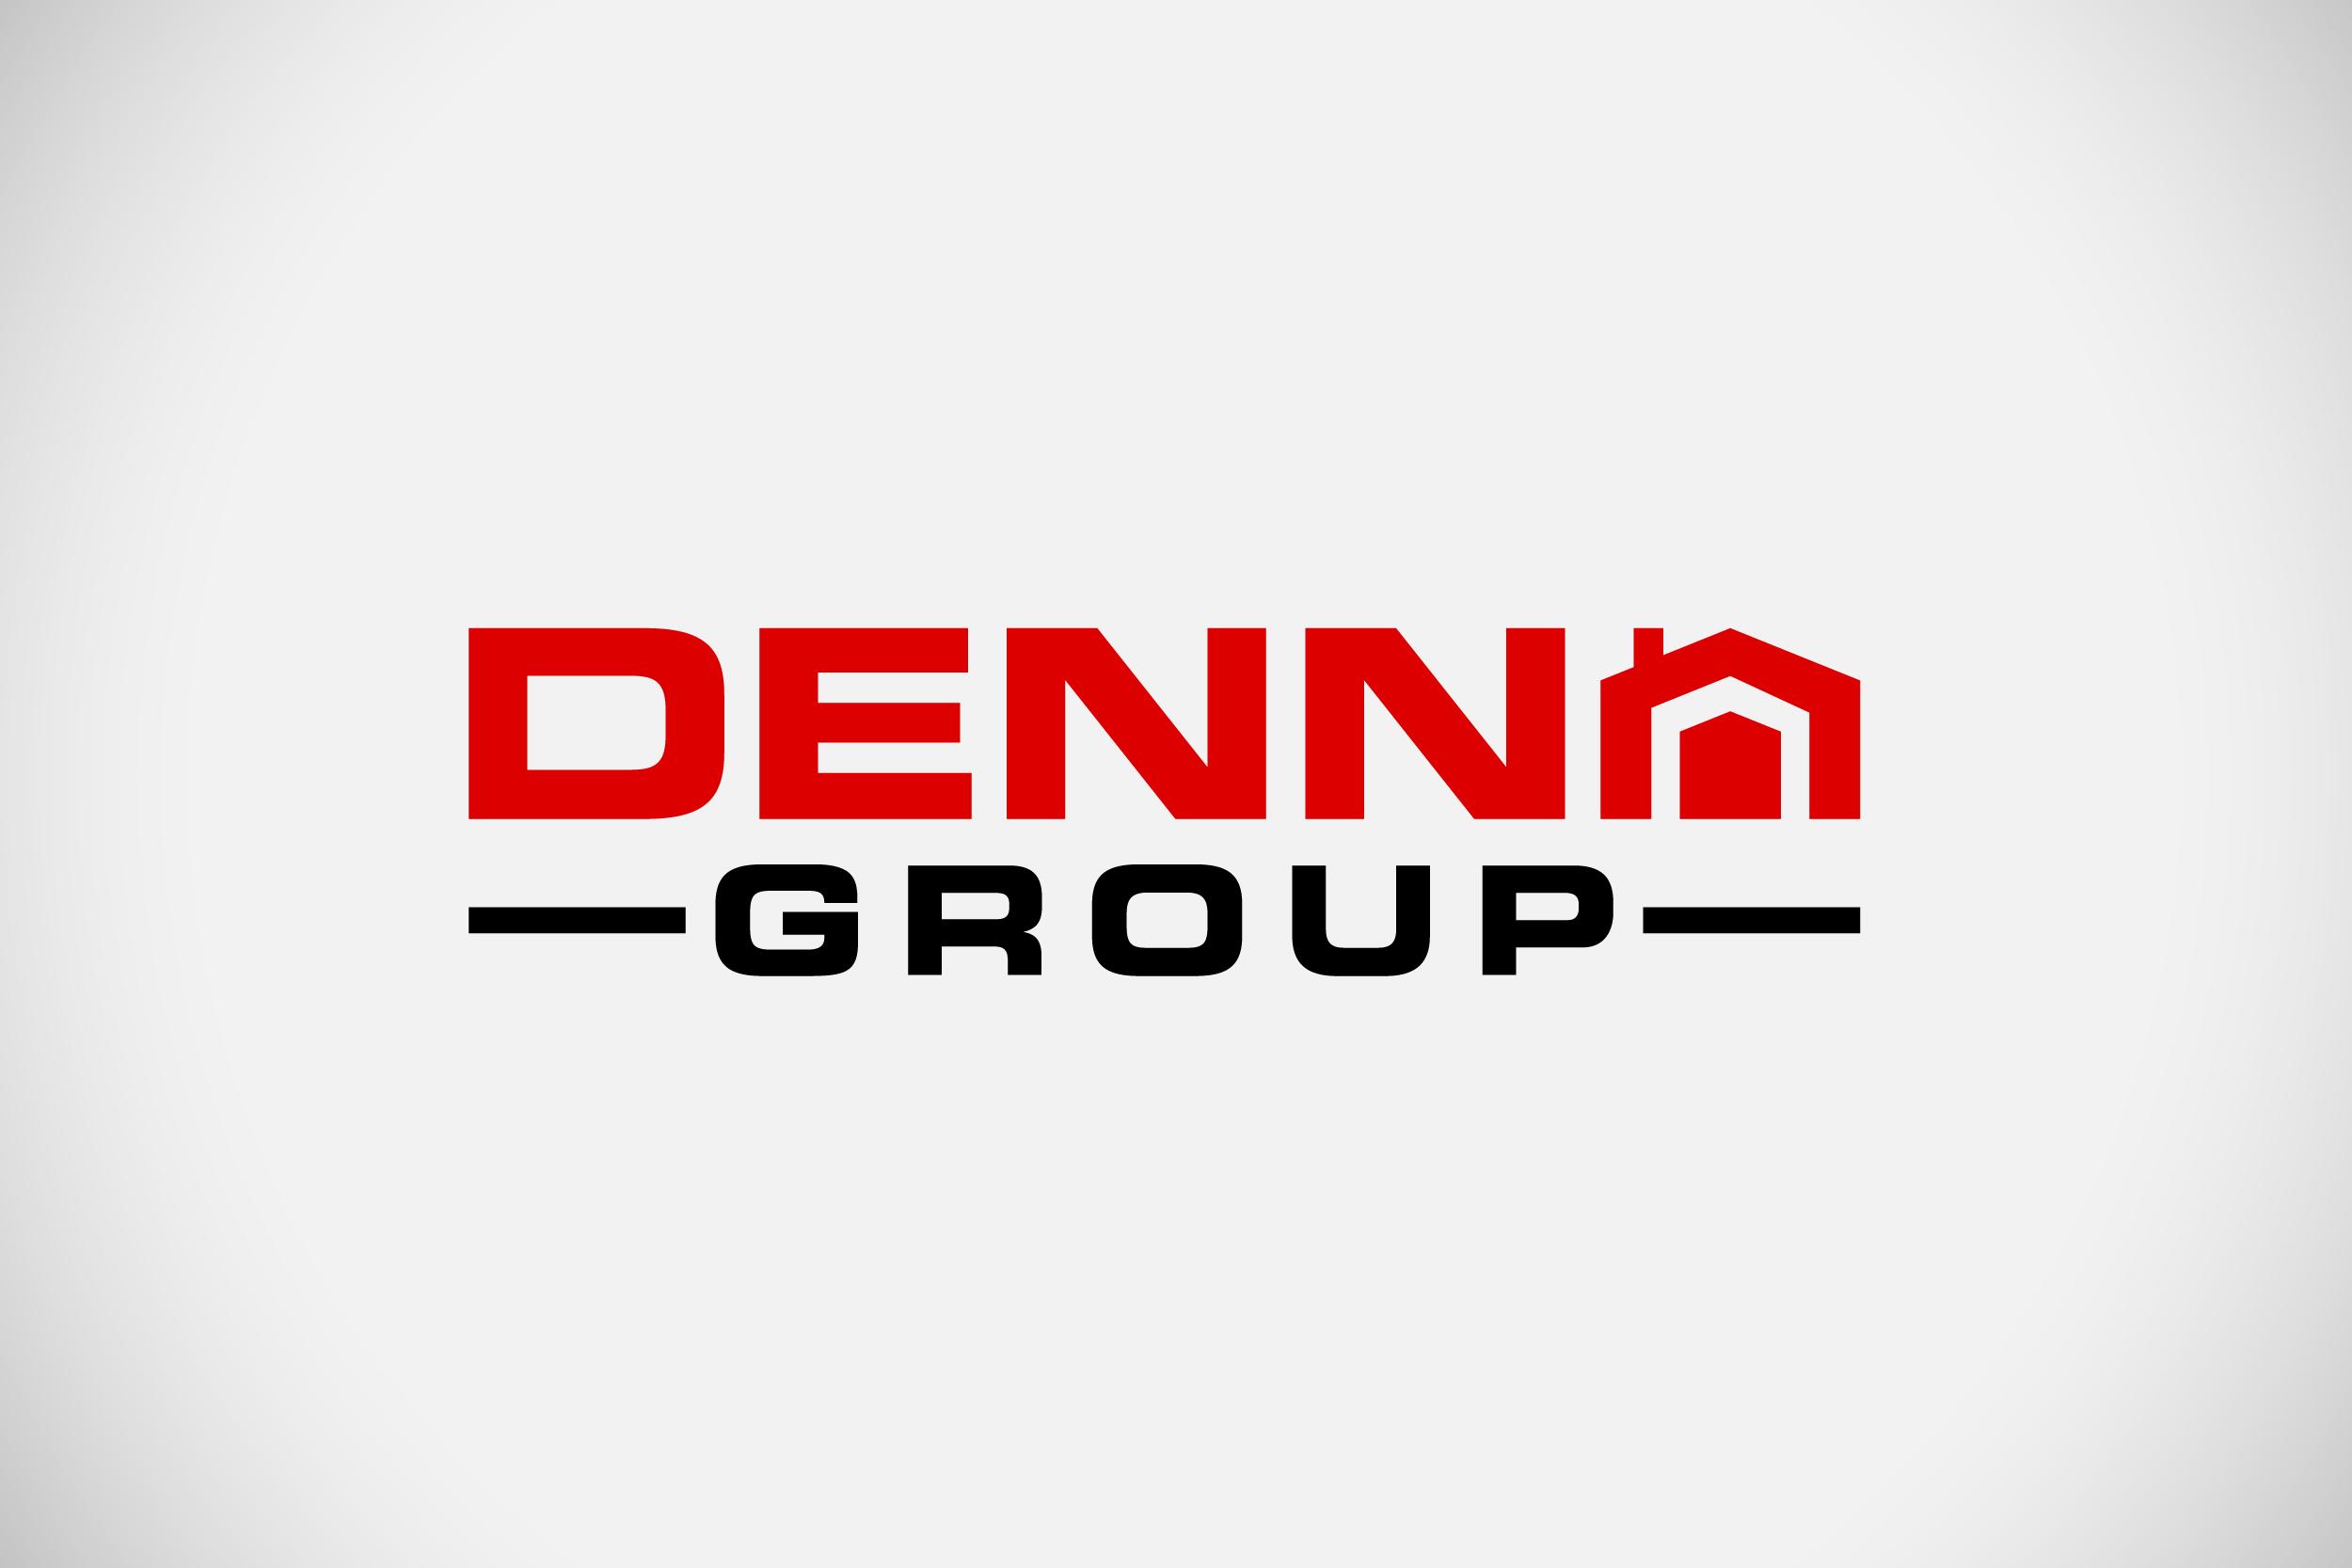 Logo Design by Private User - Entry No. 303 in the Logo Design Contest Denna Group Logo Design.